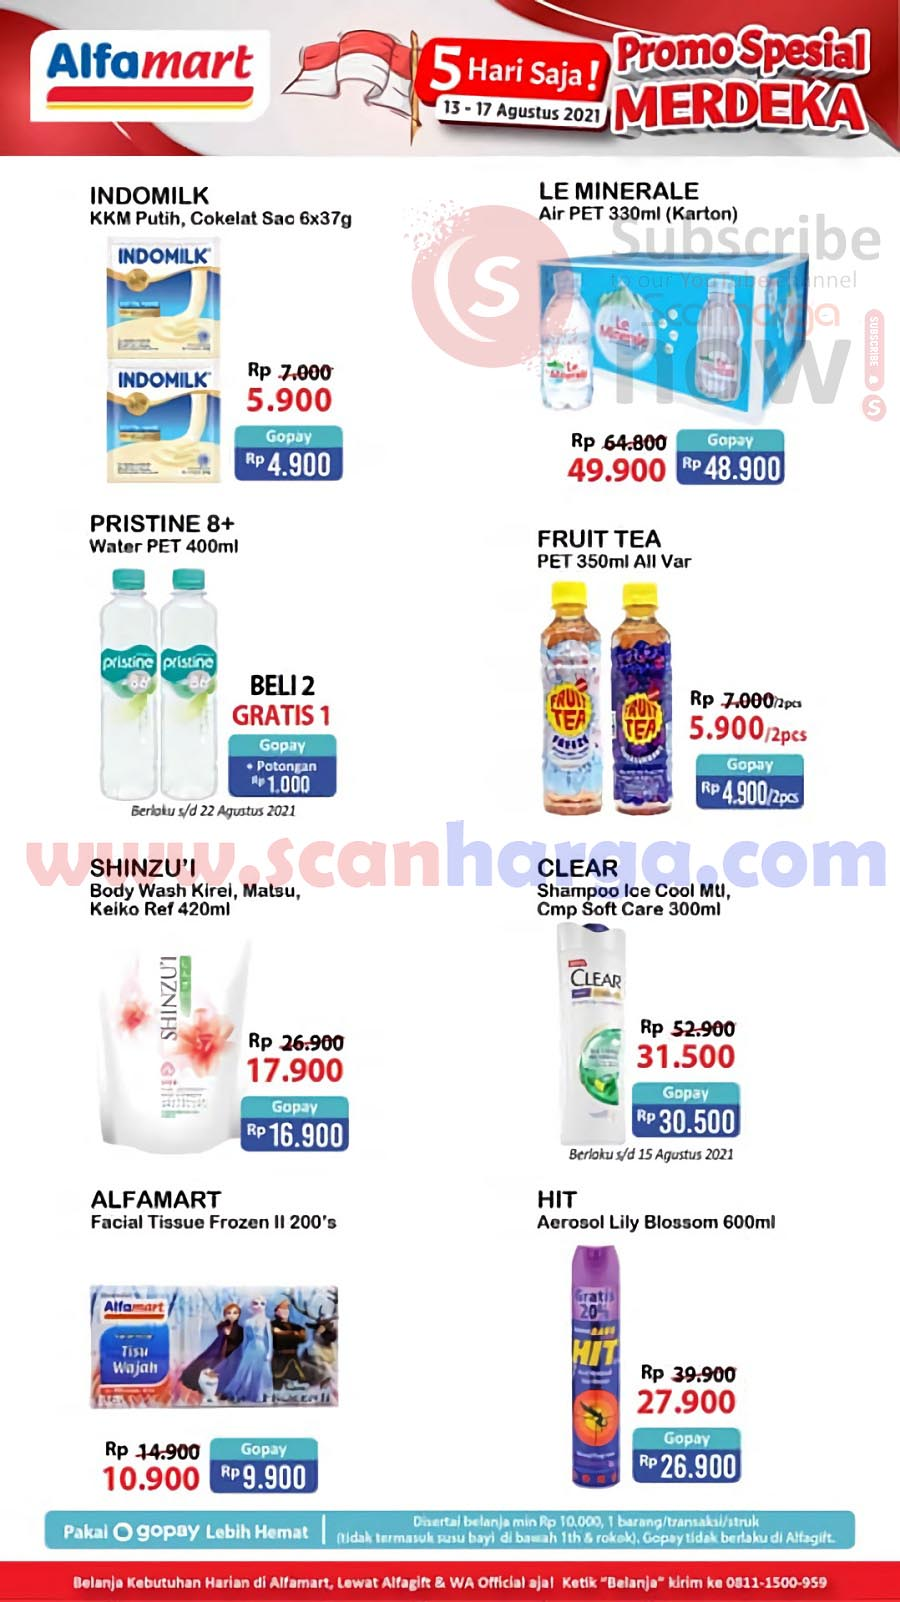 Katalog Promo JSM Alfamart Weekend 13 - 17 Agustus 2021 4